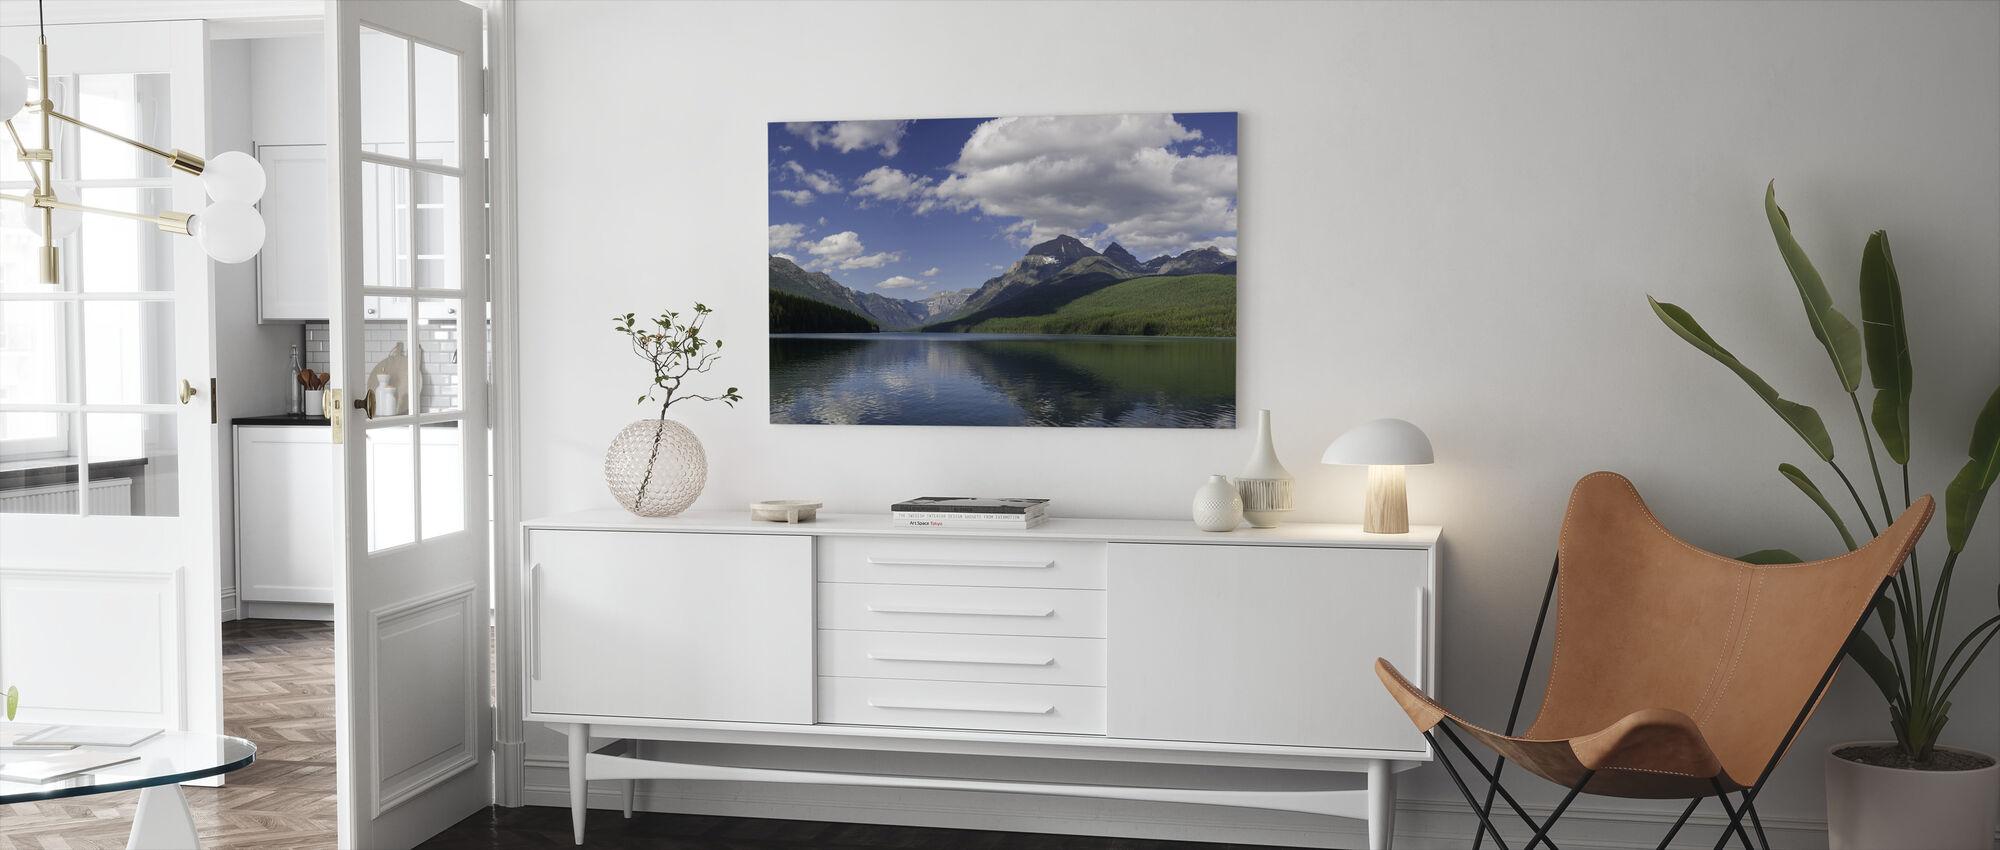 Bowman Lake Panorama - Canvas print - Living Room